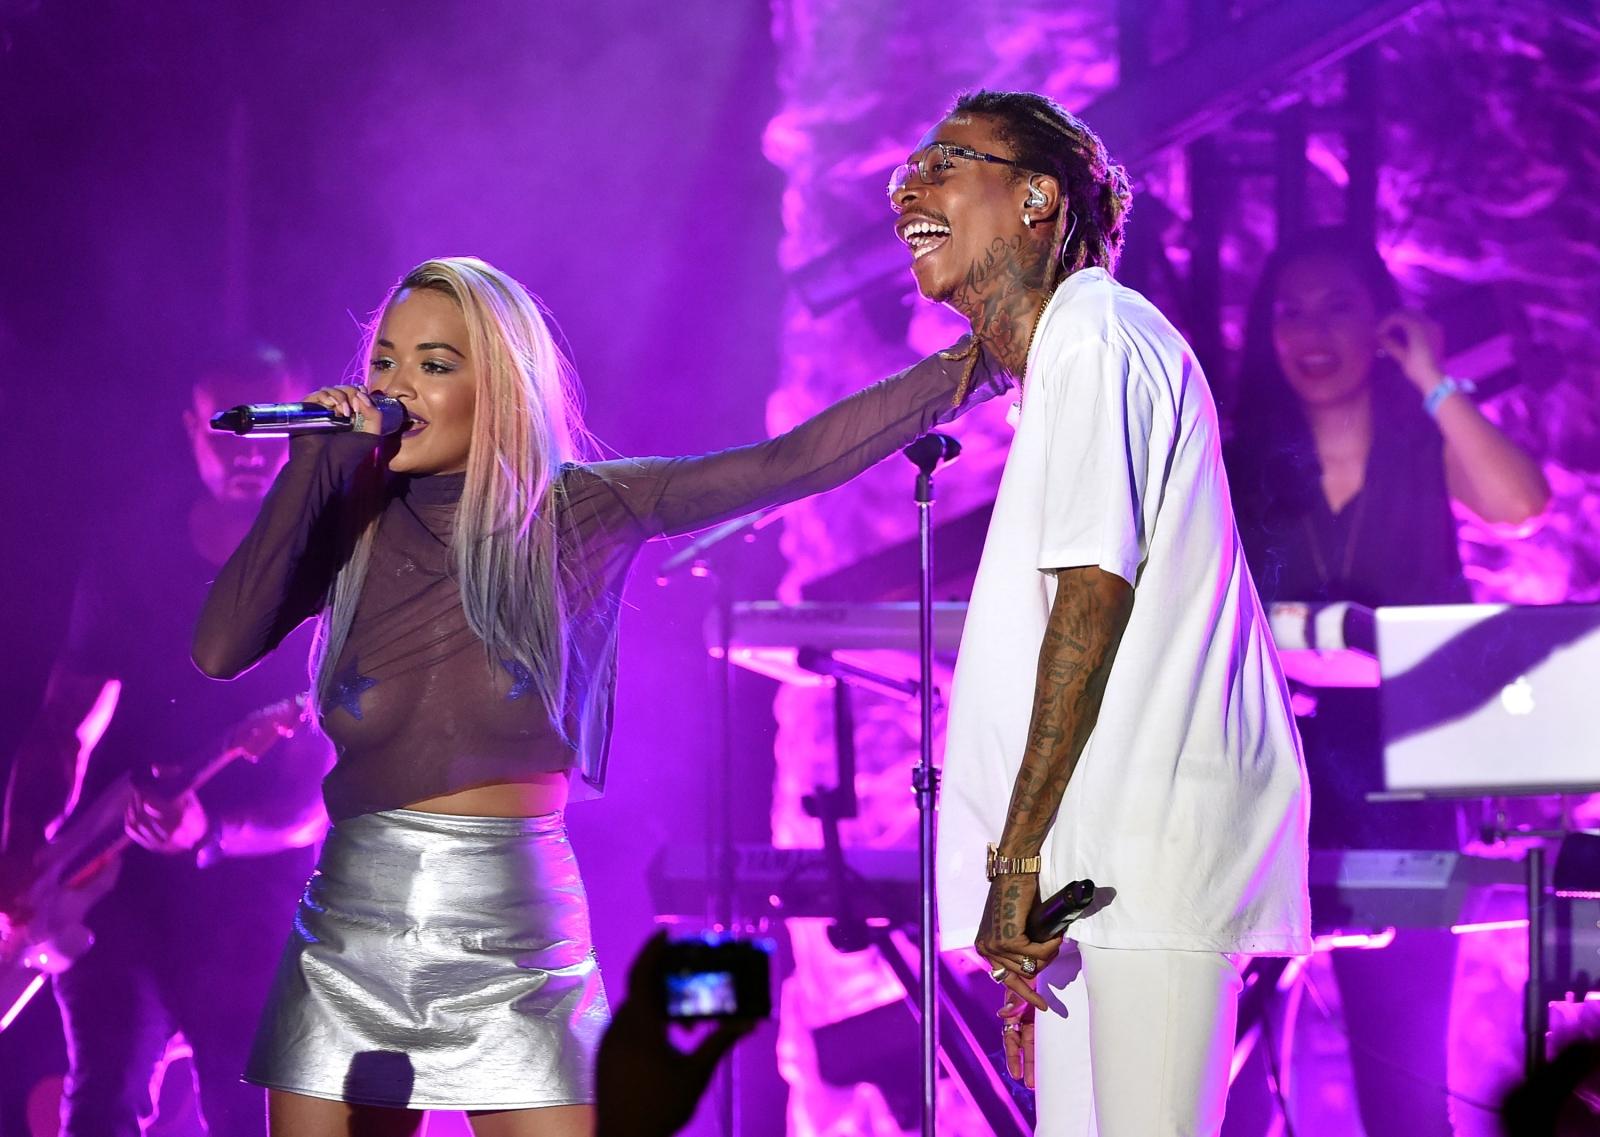 Rita Ora and Wiz Khalifa